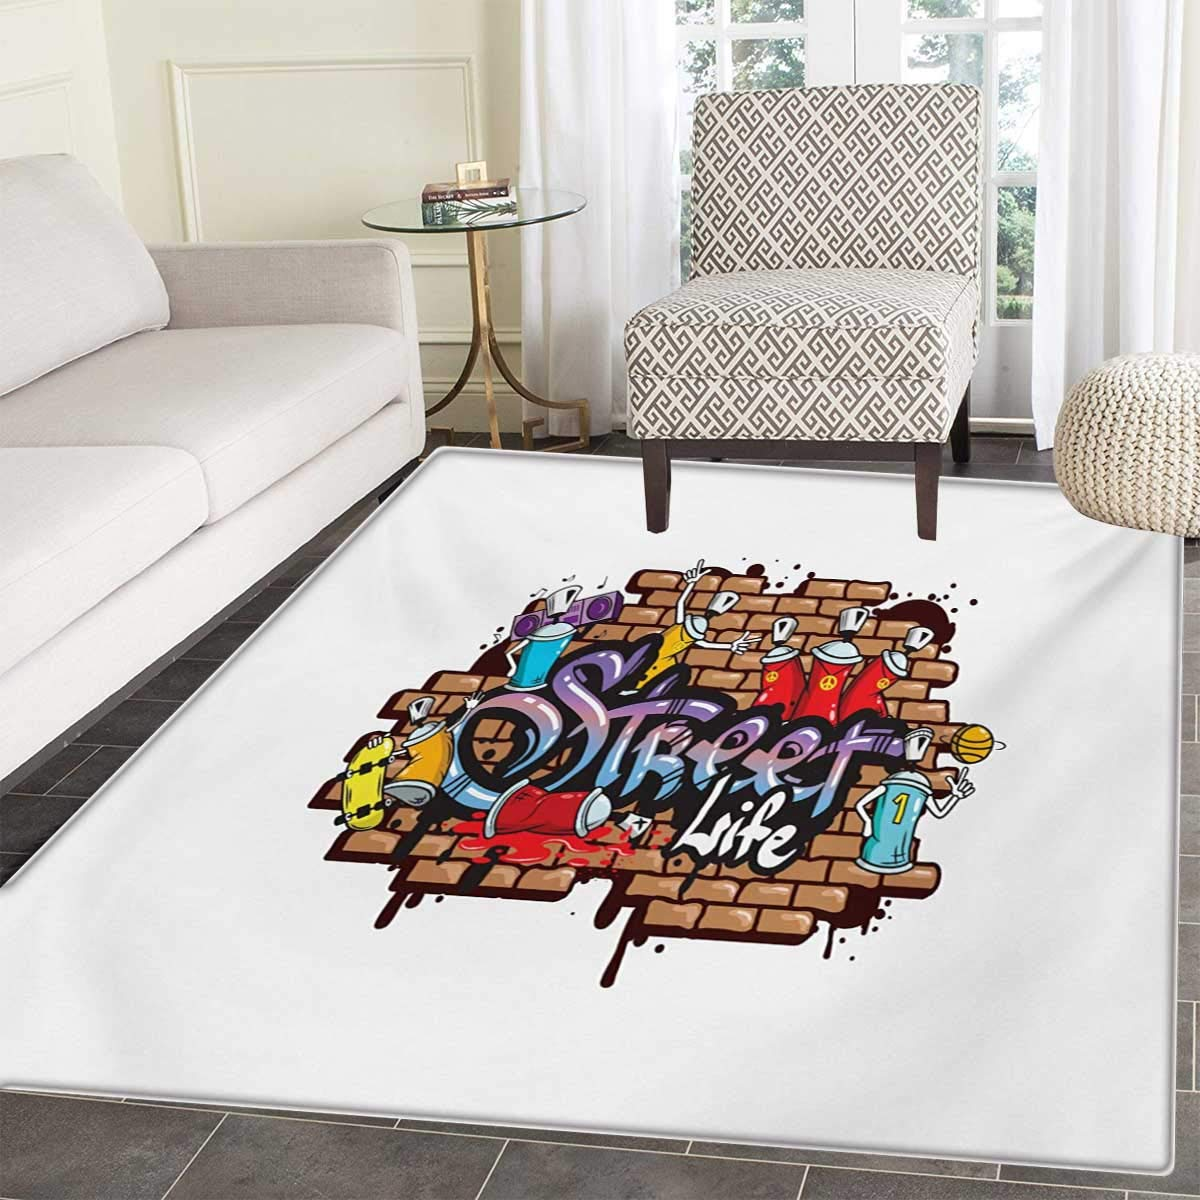 Amazon com youth bath mats carpet urban world street life graffiti art spraycan characters drippy blotchy letters floor mat pattern 30x40 multicolor